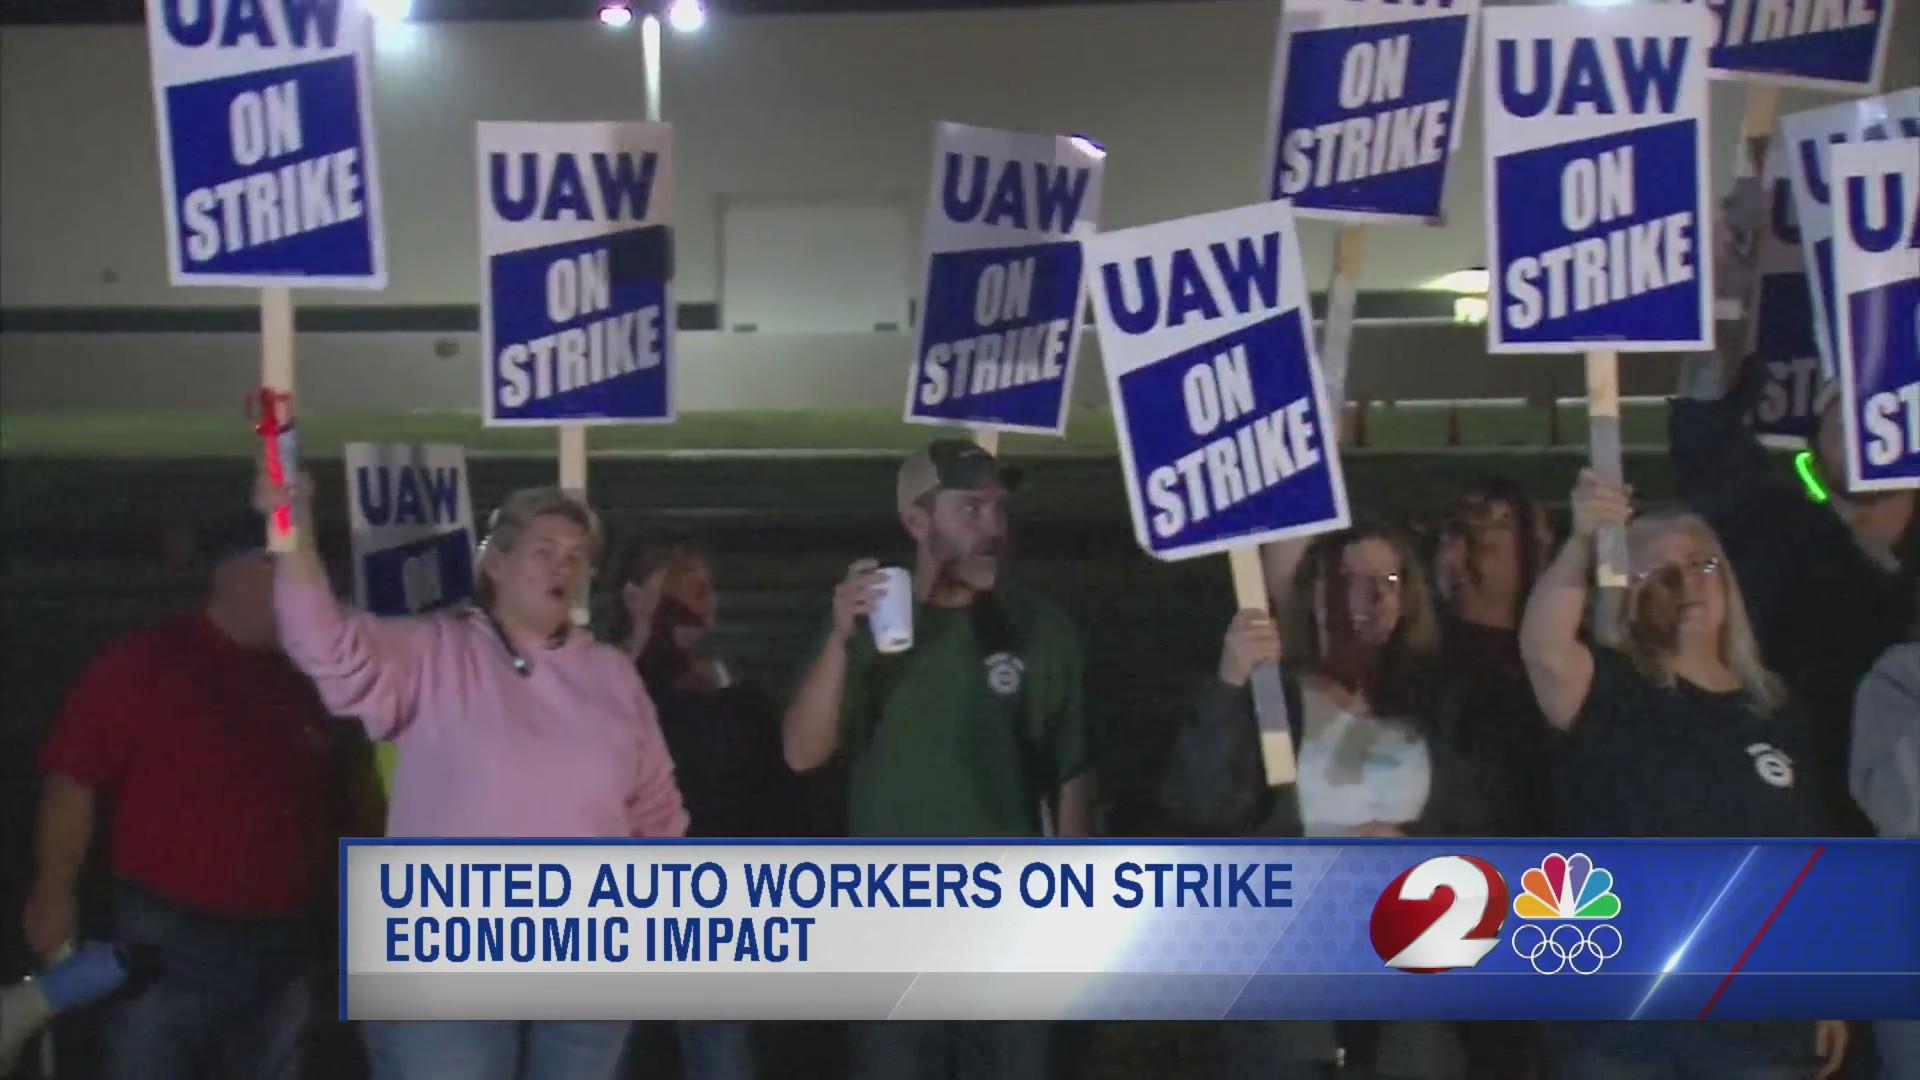 United Auto Workers on strike